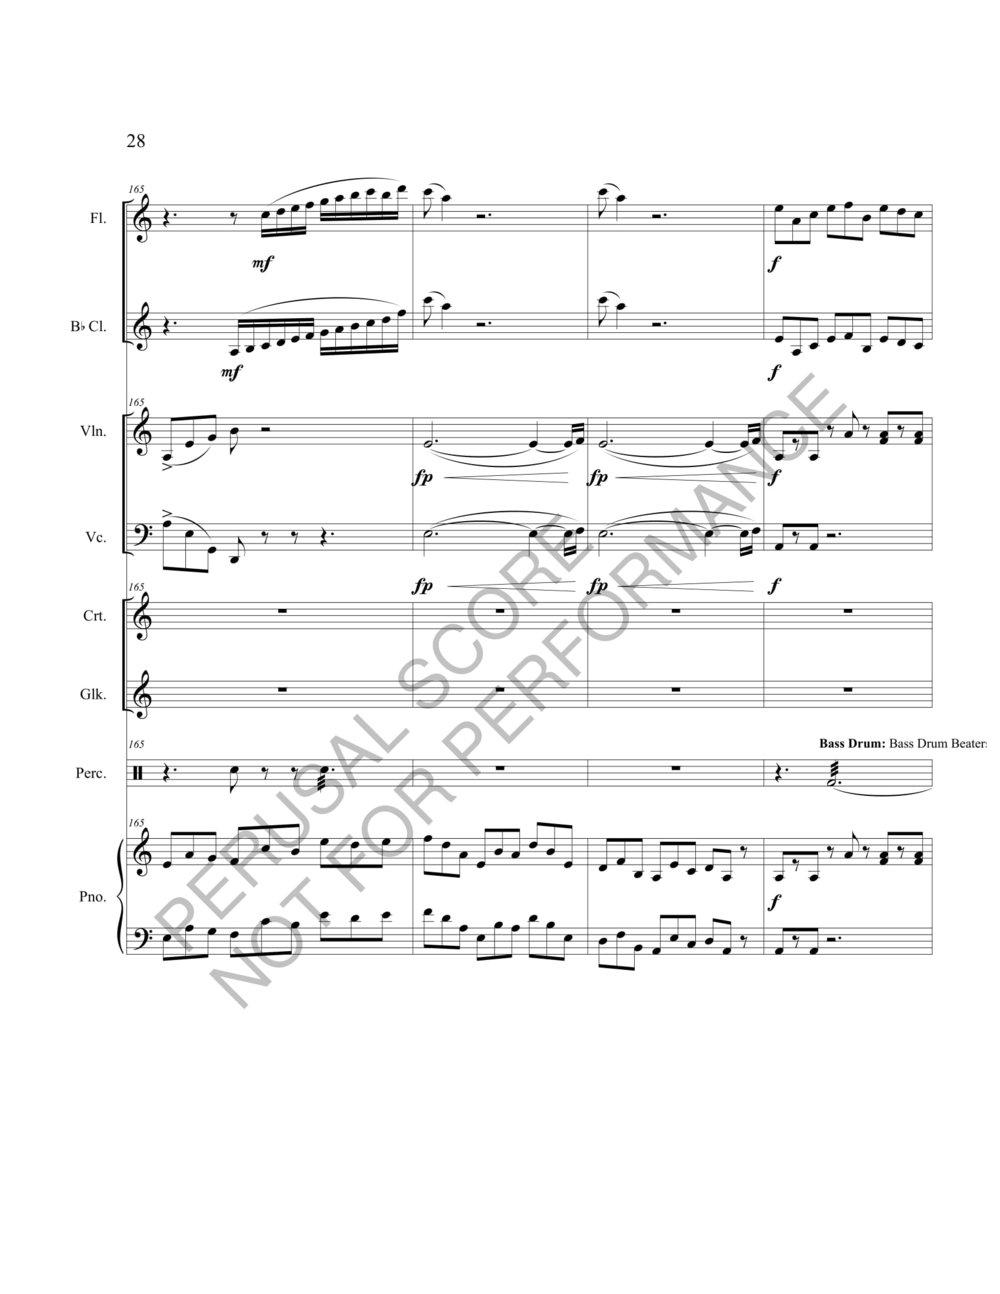 Boyd Terra Liberi Score-watermark-34.jpg